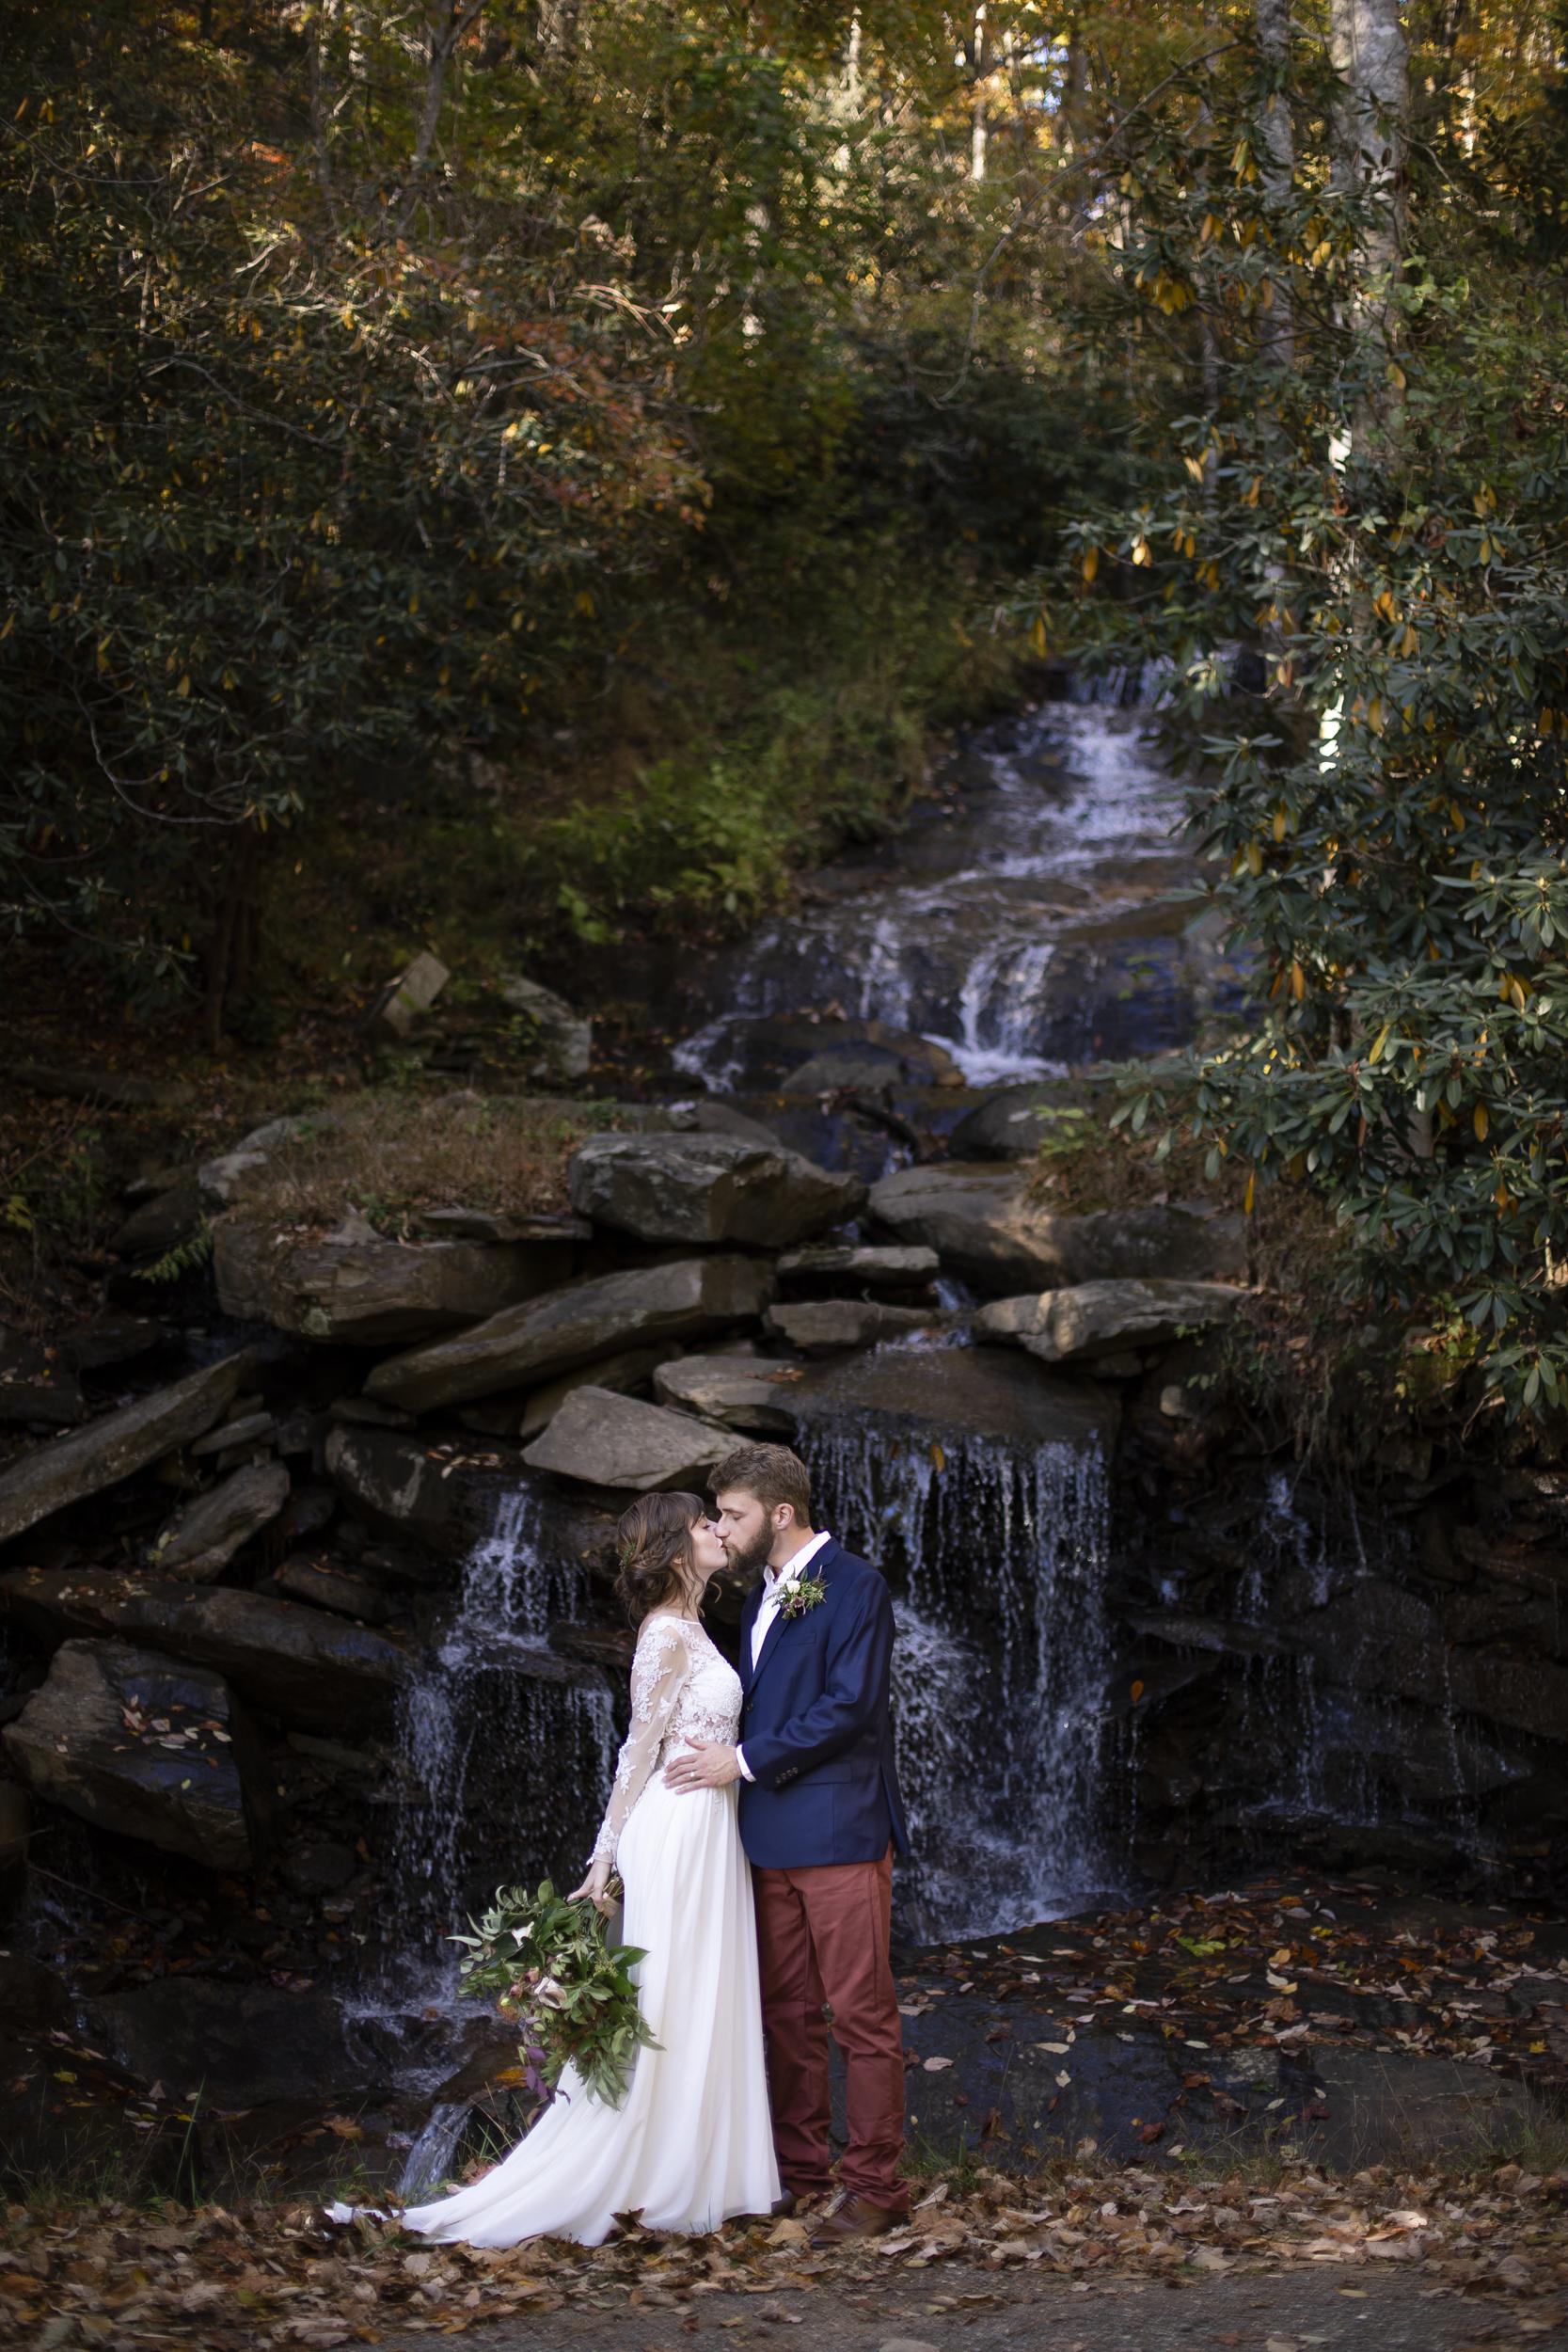 Laurel Falls Wedding October 2018_Allison and Josh__Lola Salon_Flora_Photo by Studio Misha Photography-106.jpg